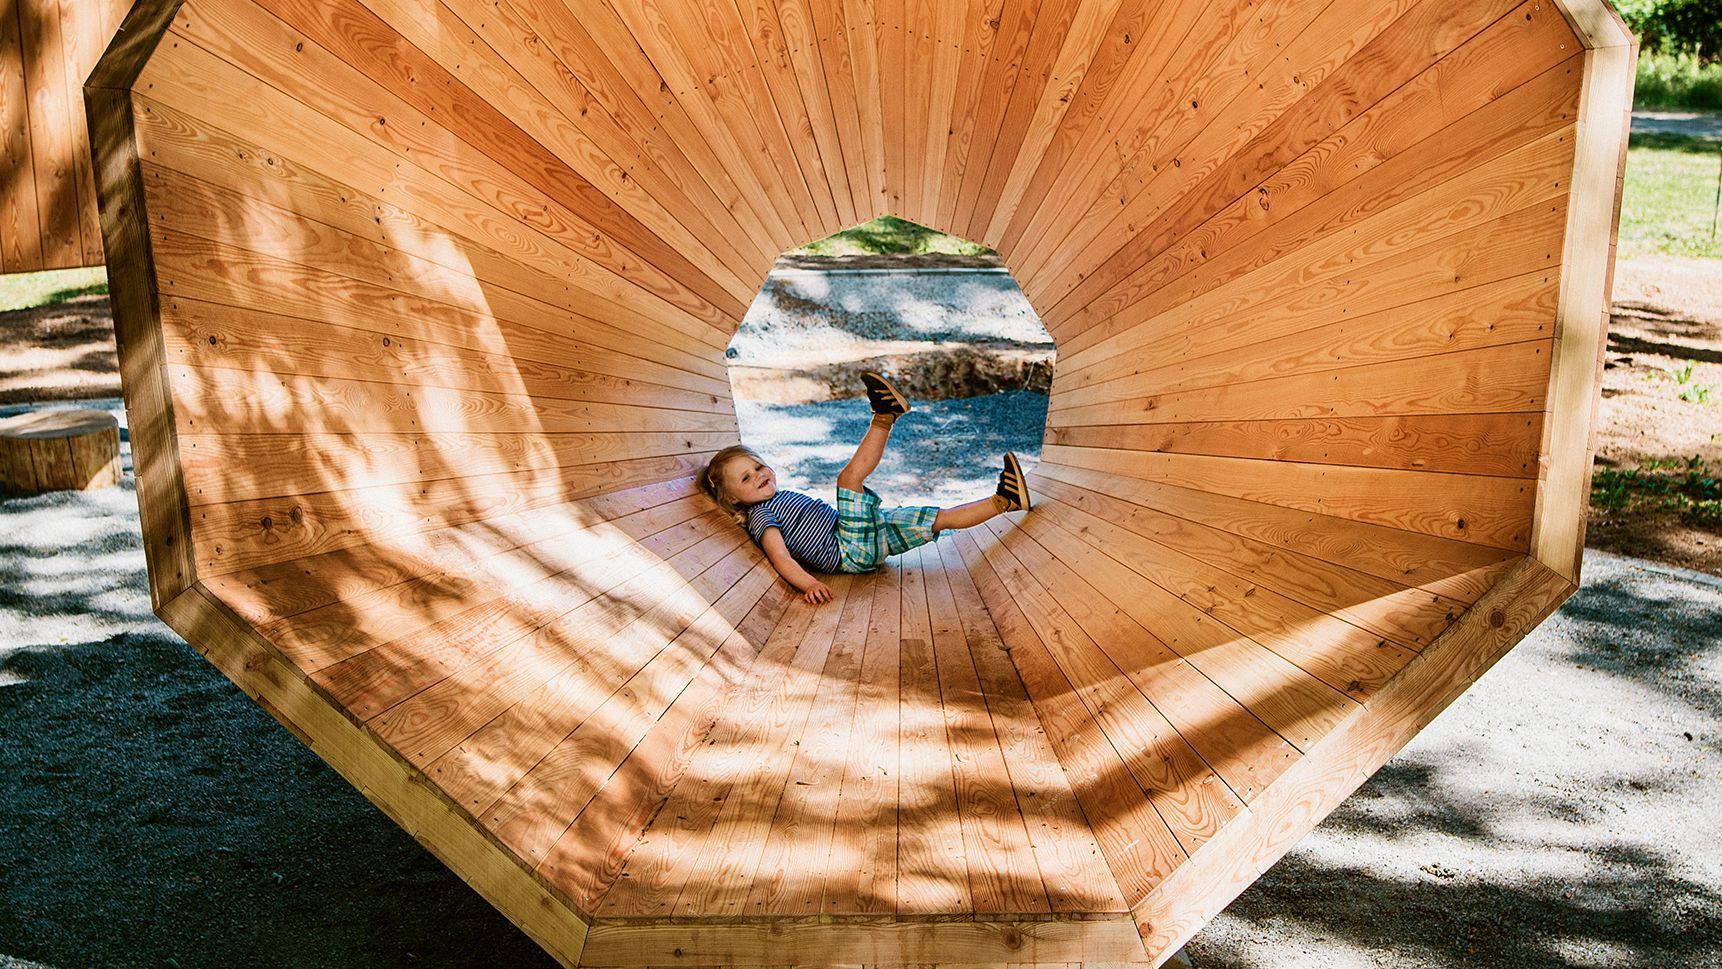 Naturklangverstärker auf dem Smart Pfad Odenwald